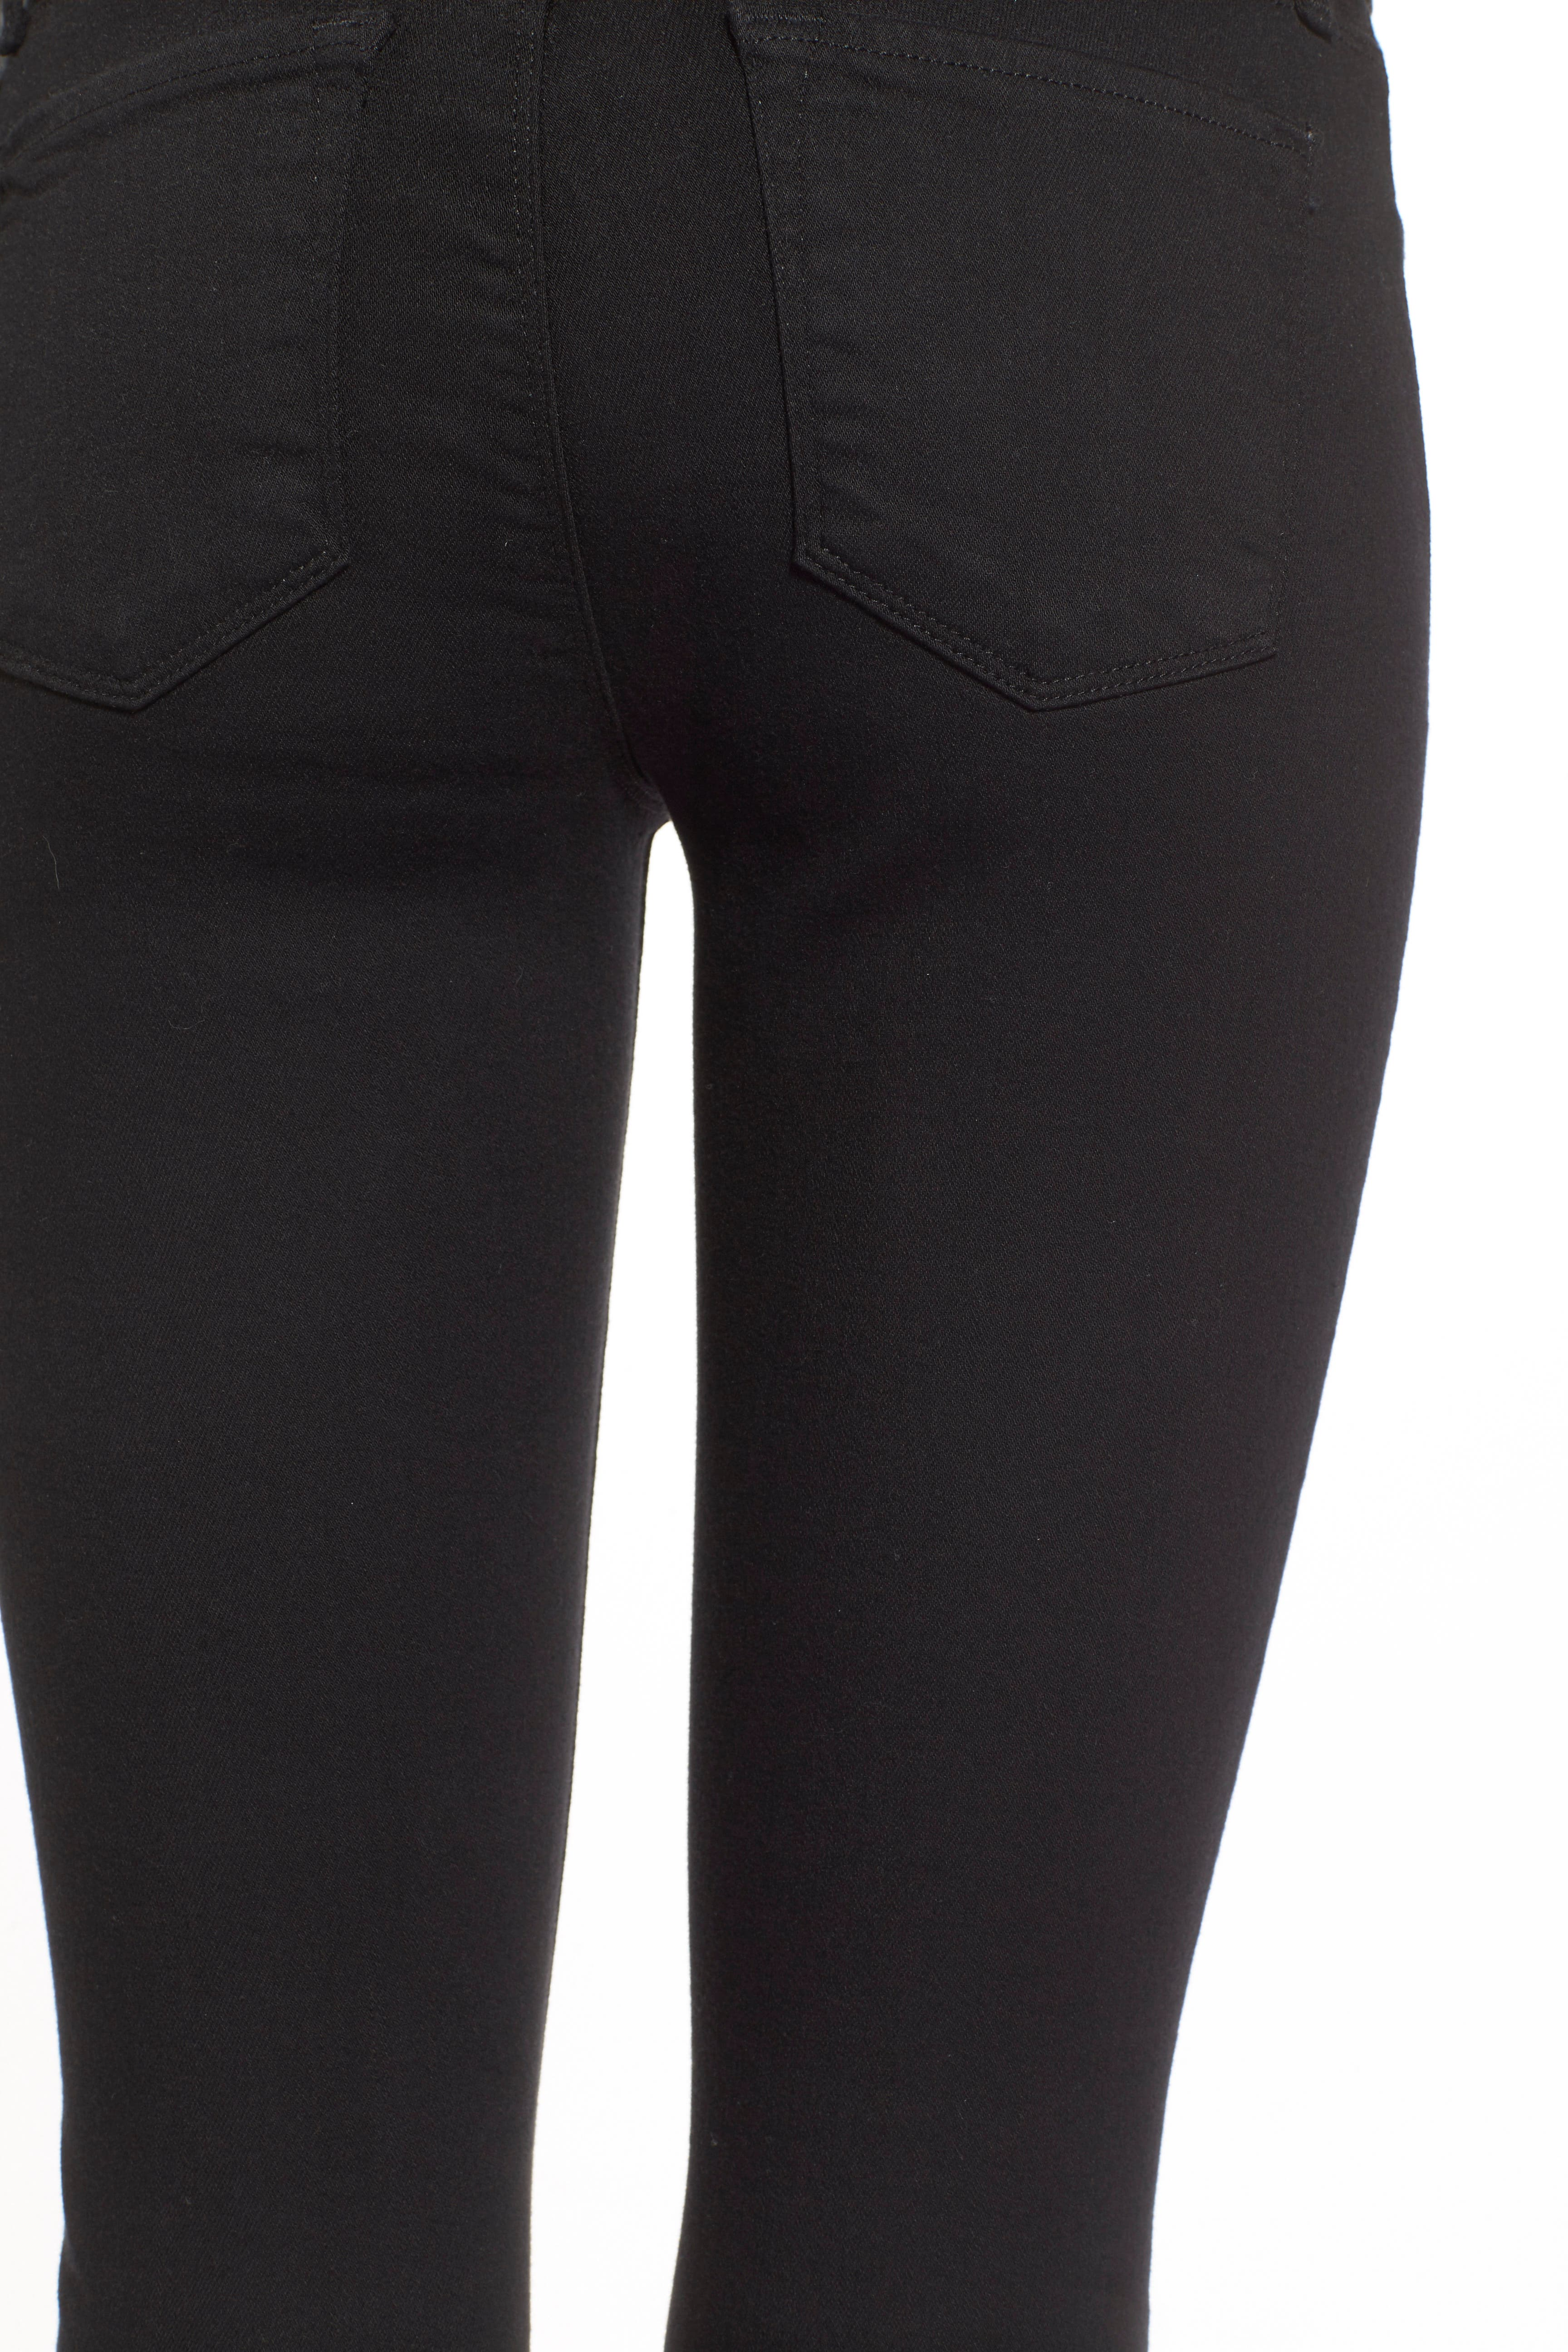 J BRAND,                             Super Skinny Jeans,                             Alternate thumbnail 4, color,                             SERIOUSLY BLACK